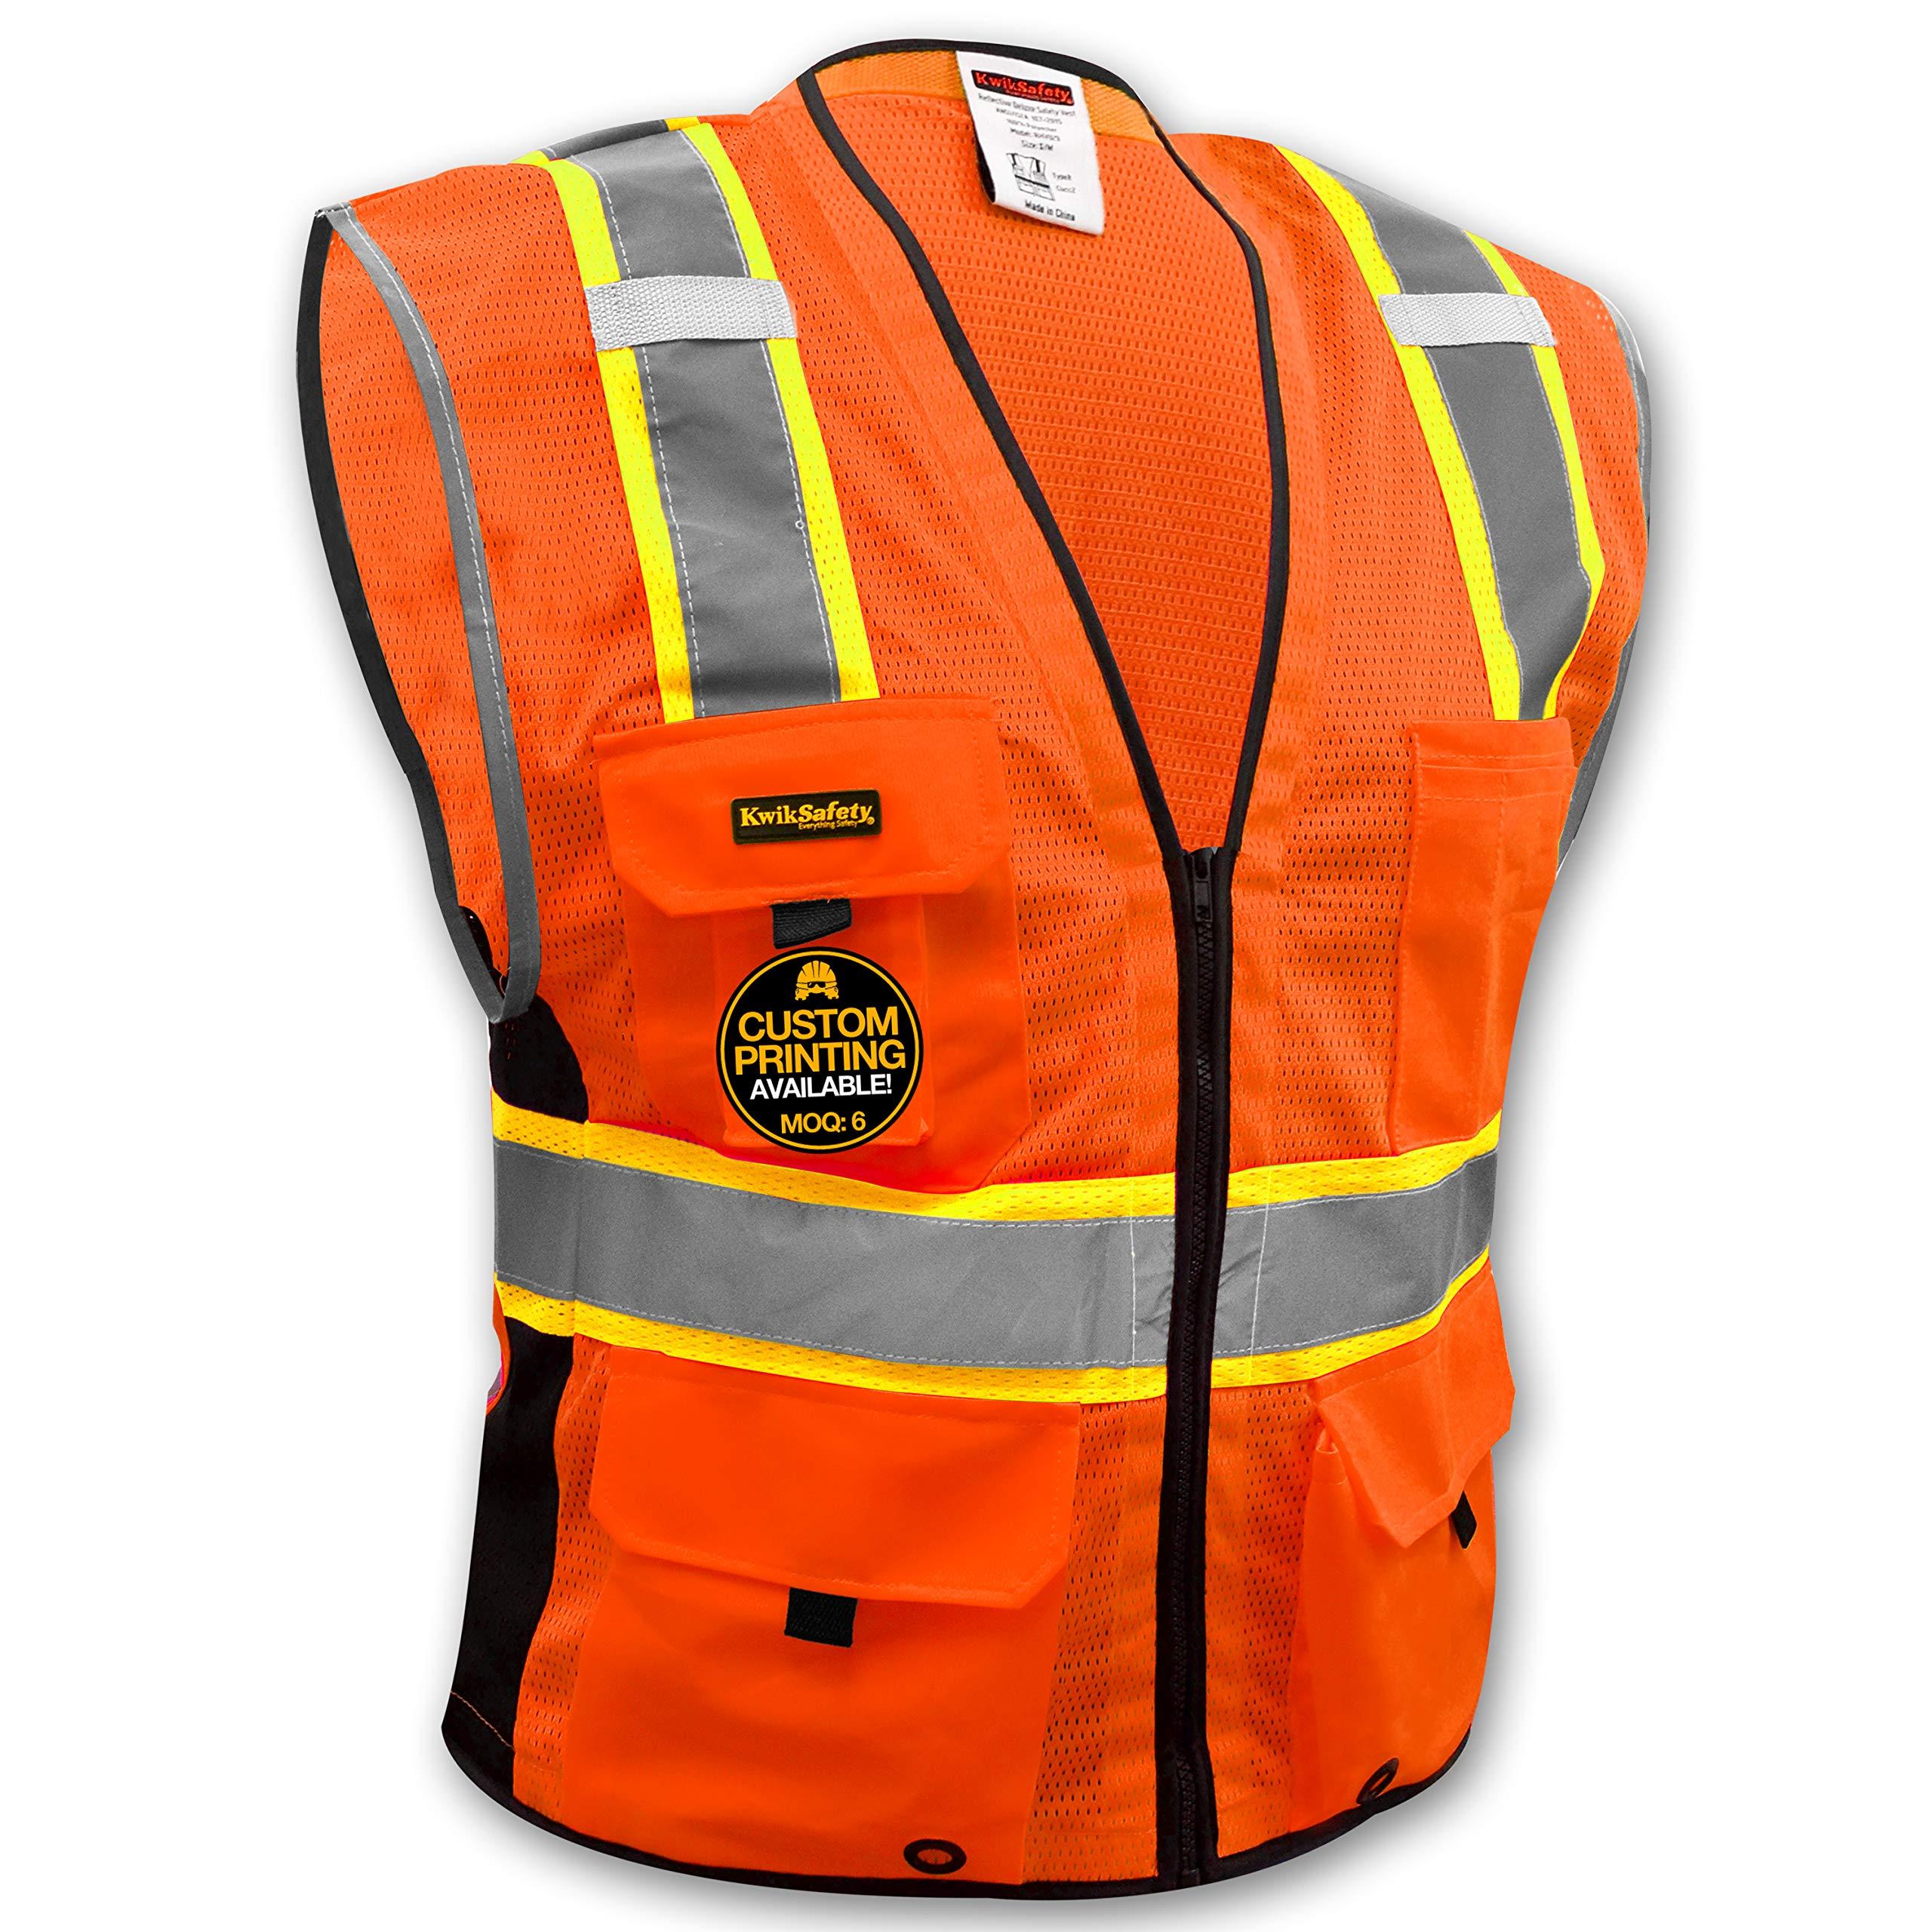 KwikSafety (Charlotte, NC) BIG KAHUNA Class 2 ANSI Safety Vest OSHA High Visibility Reflective Stripes Heavy Duty Mesh Pockets and Zipper Hi-Vis Construction Work Hi-Viz Surveyor Mens Orange L/XL